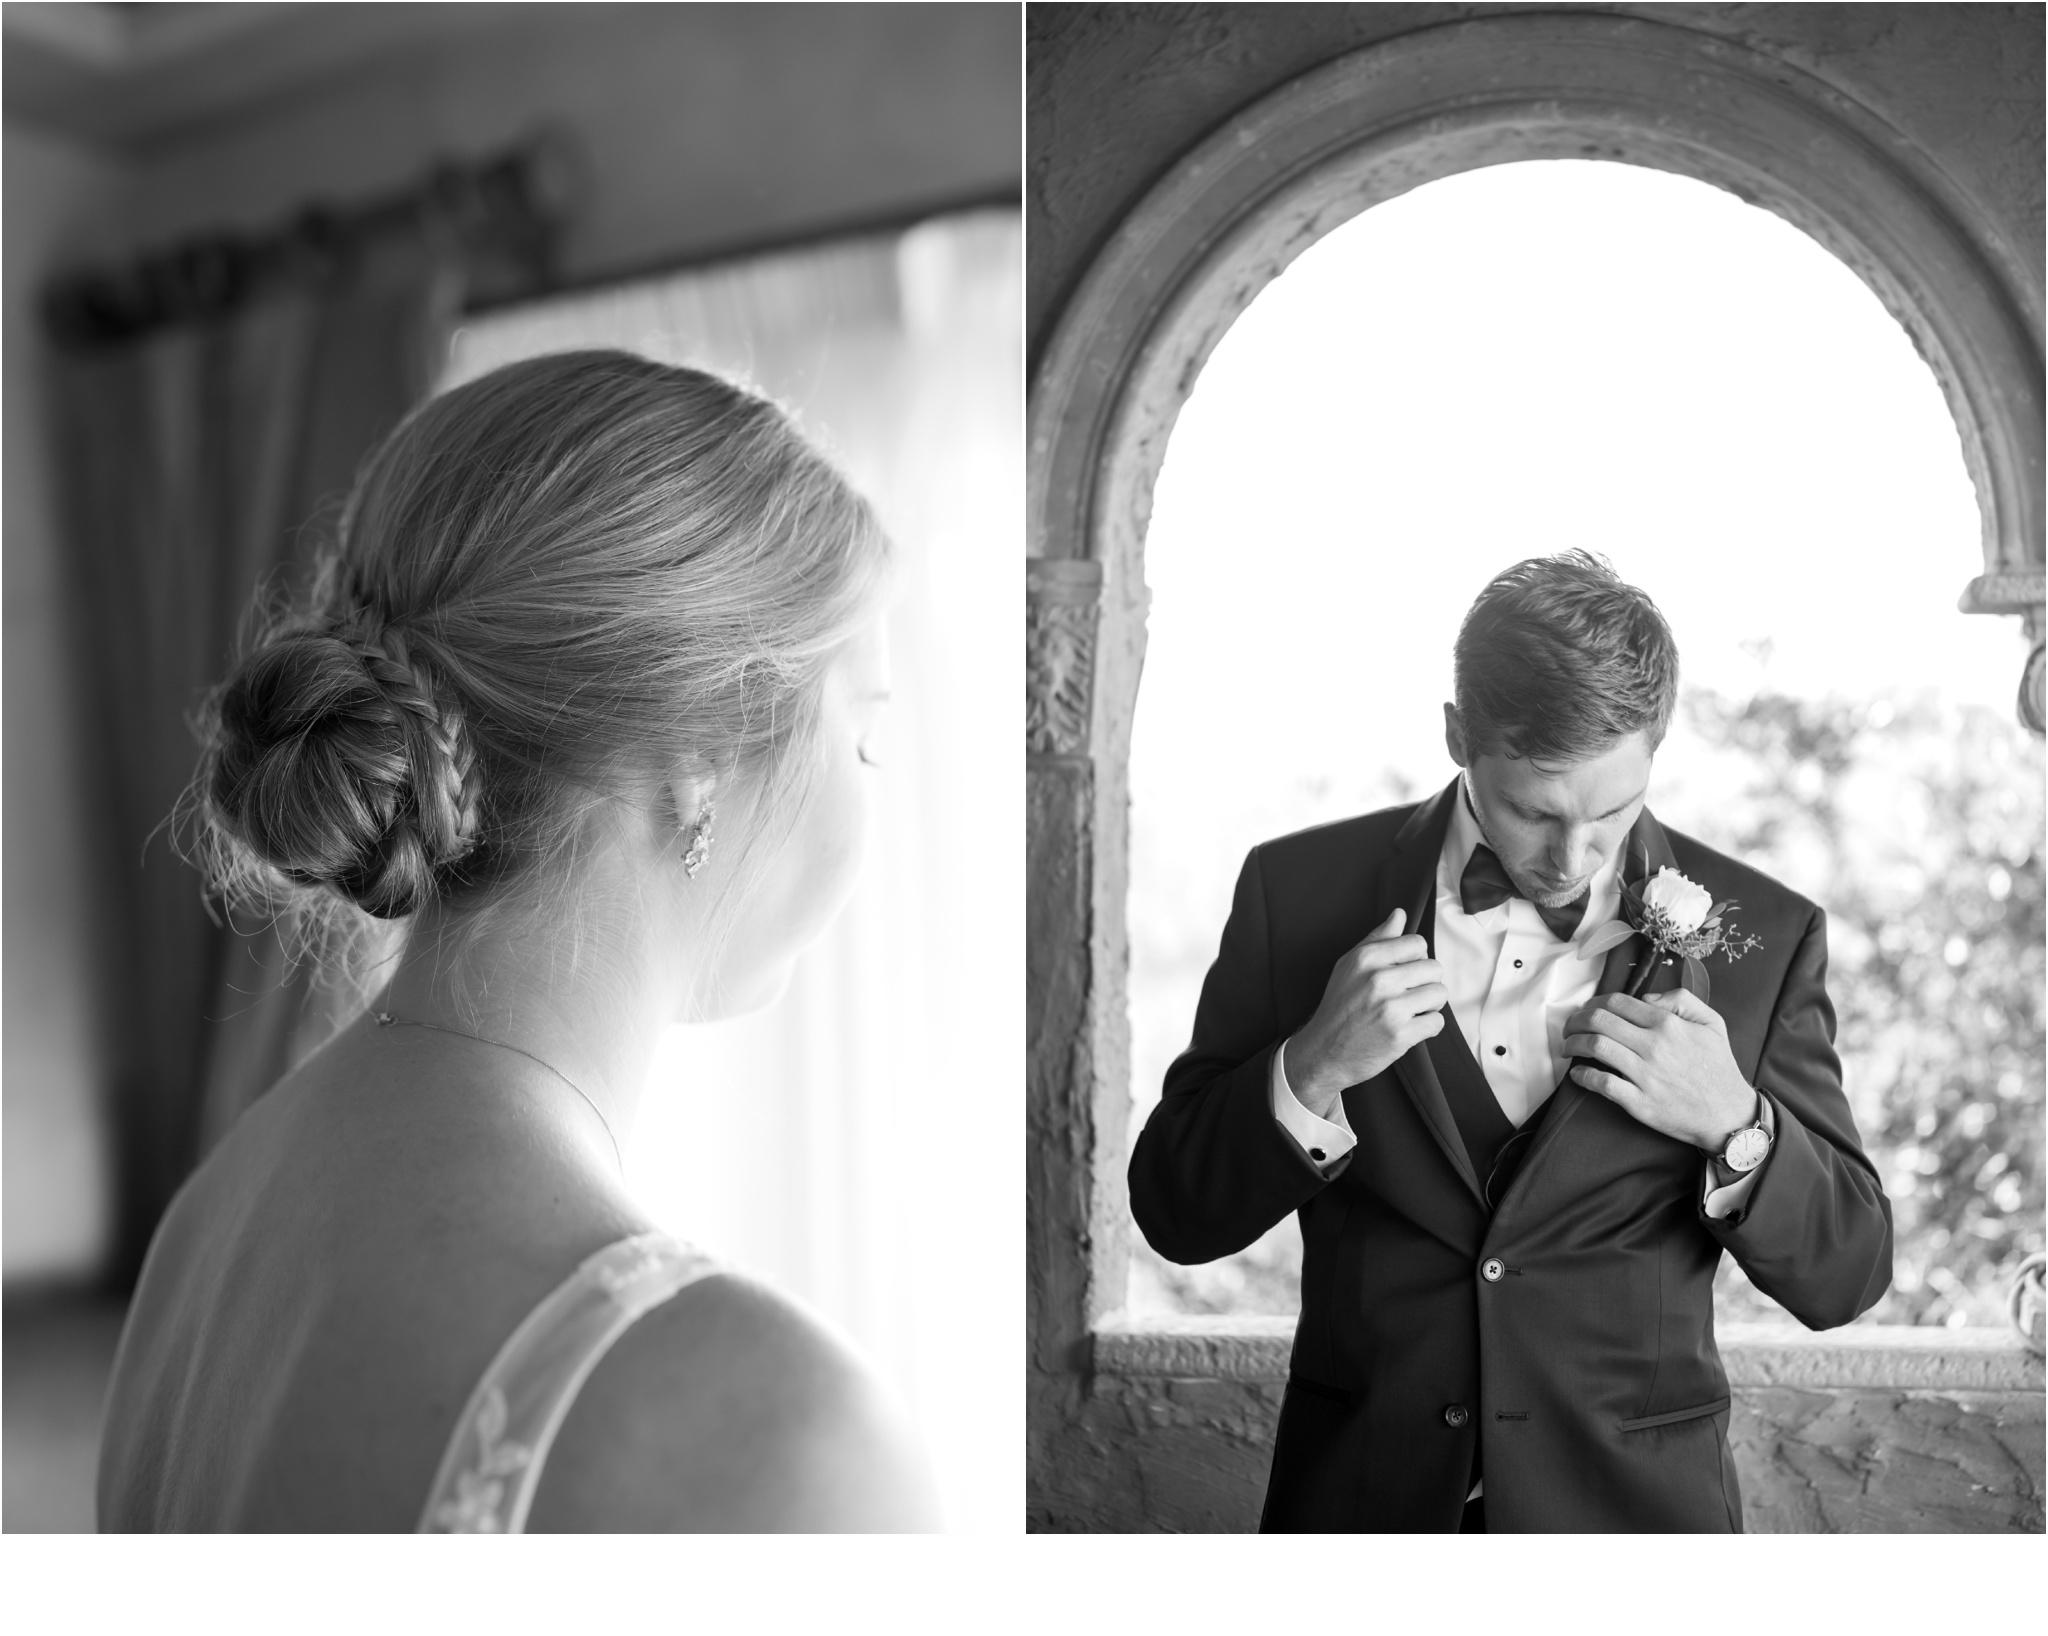 Rainey_Gregg_Photography_St._Simons_Island_Georgia_California_Wedding_Portrait_Photography_0627.jpg